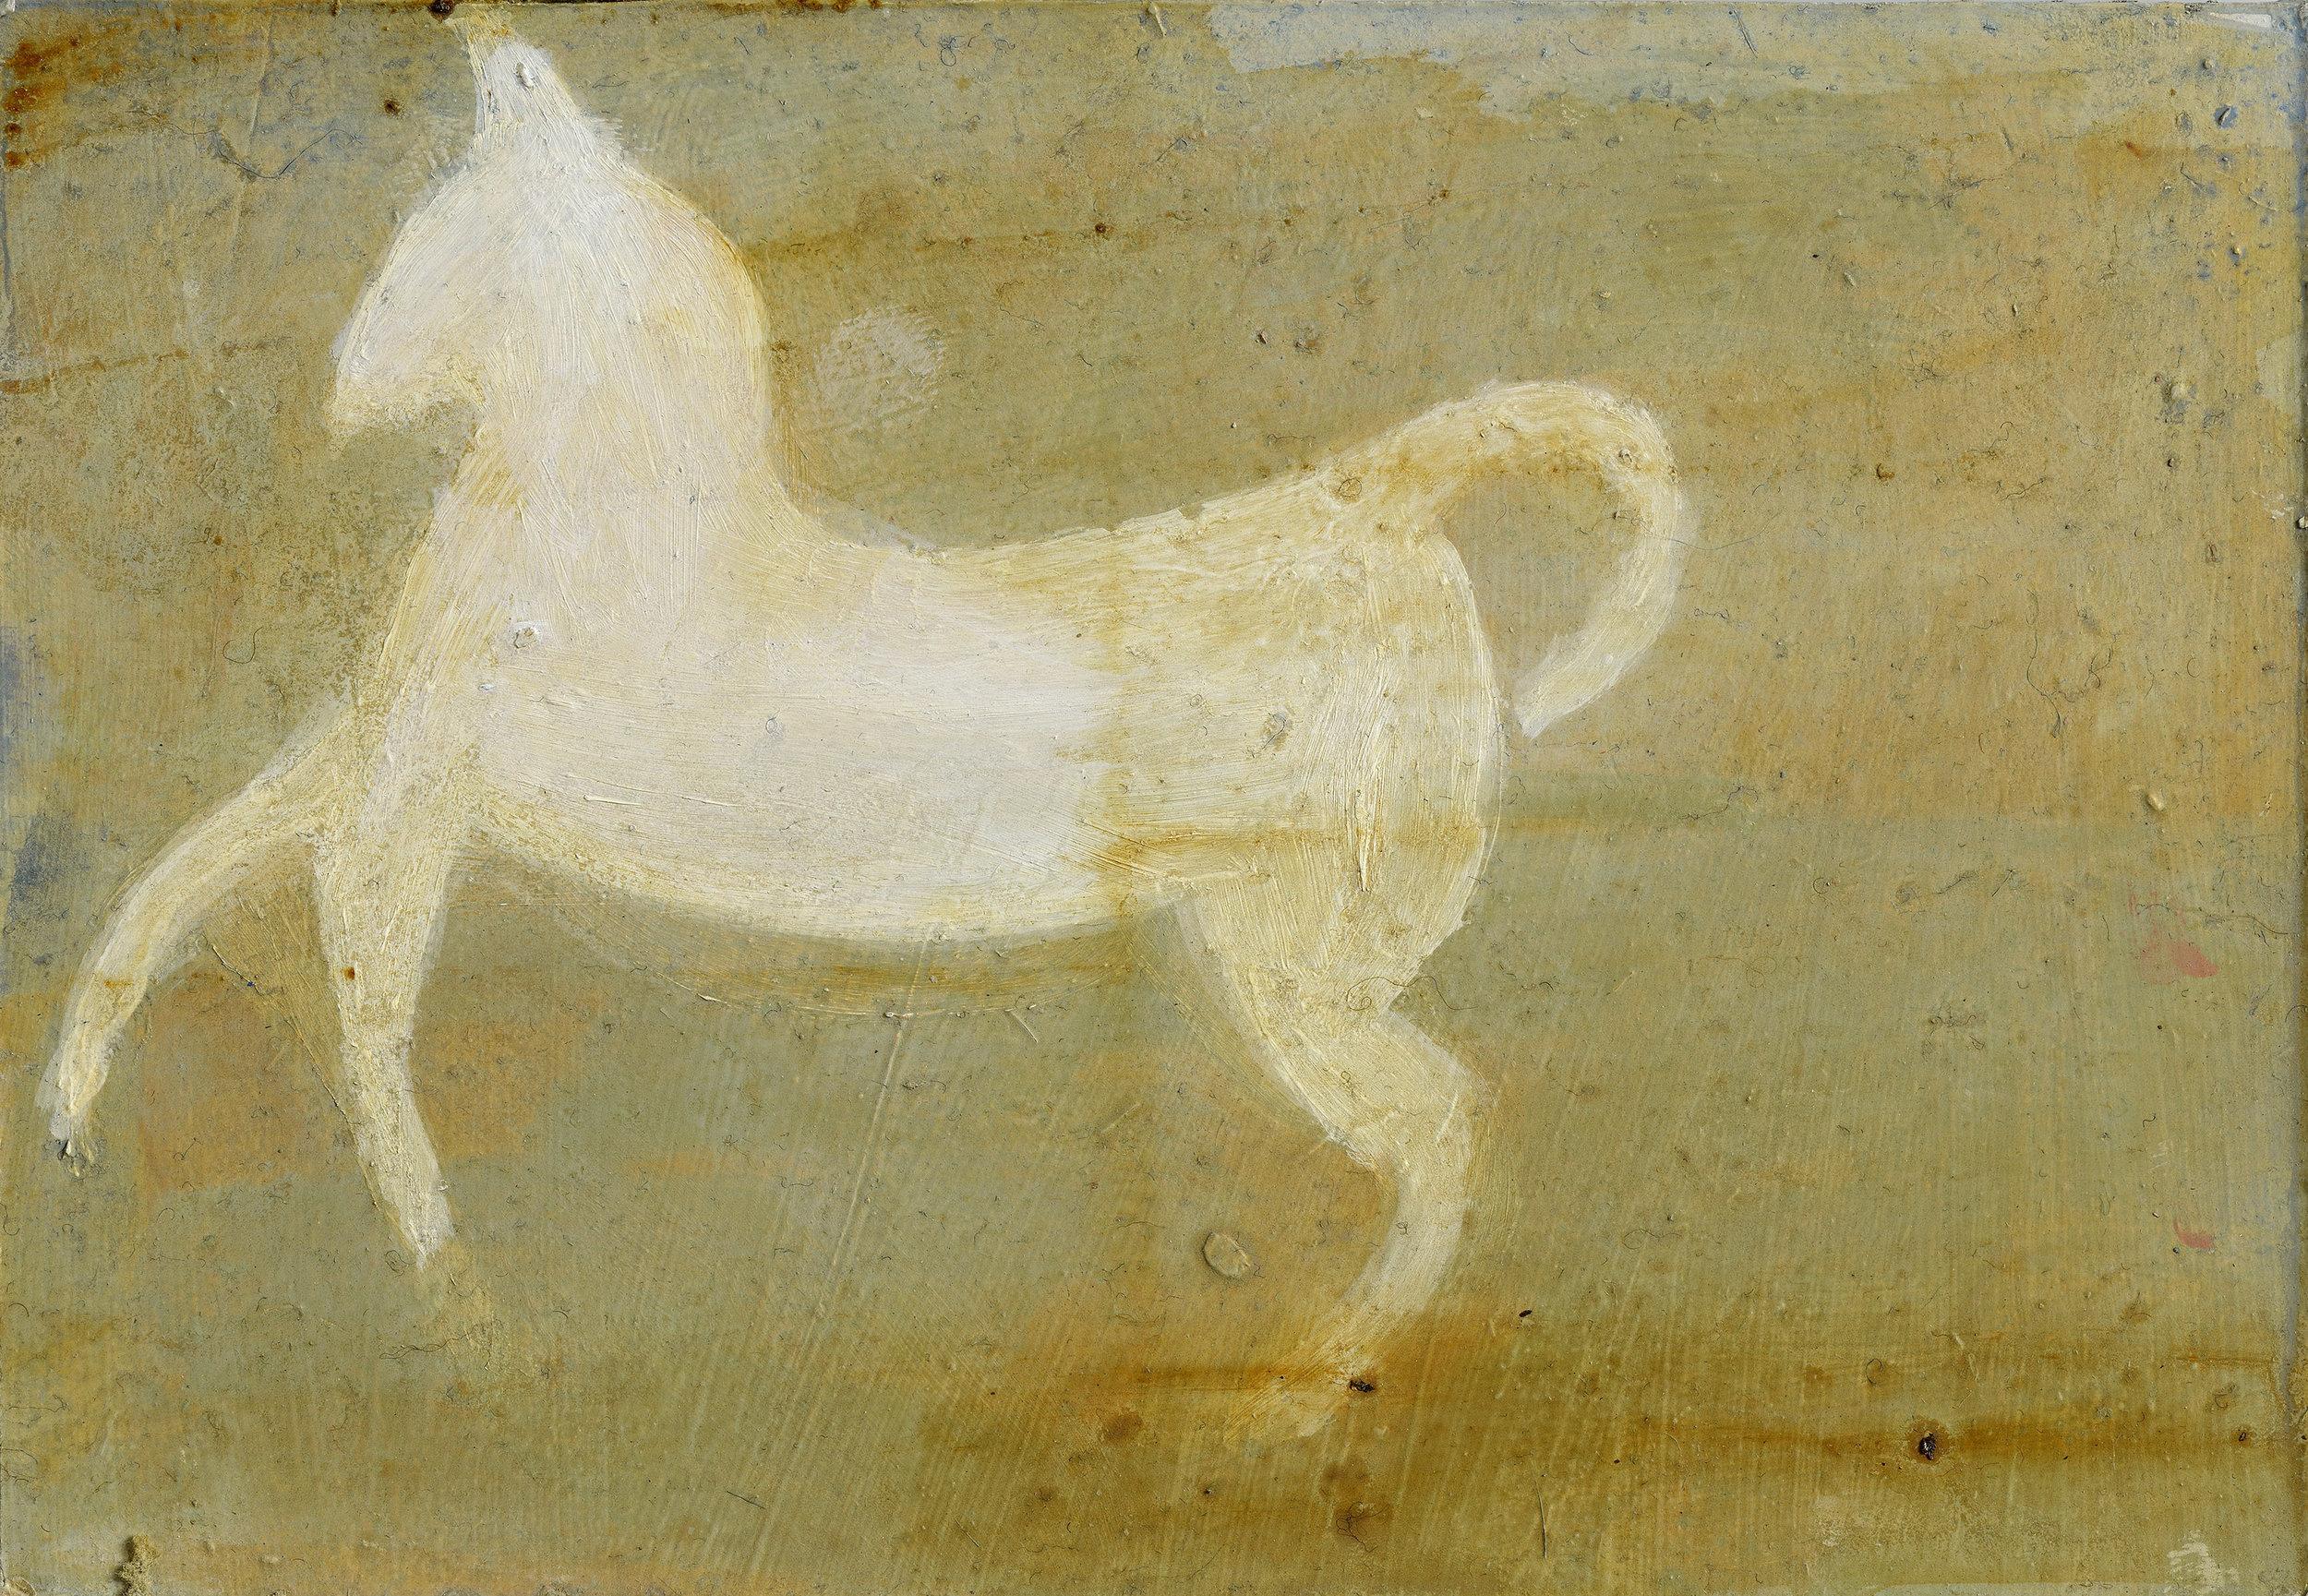 Series 1_05_White Horse_11x15cm.jpg